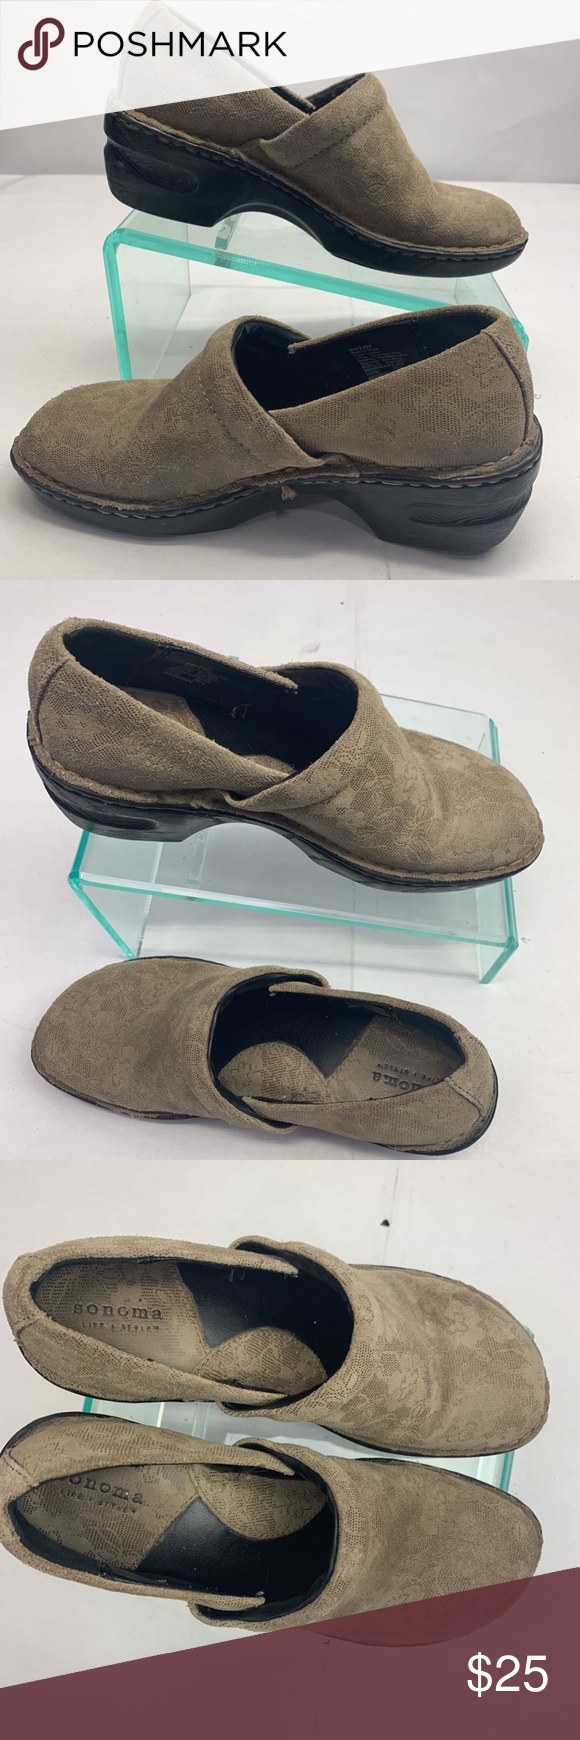 Sonoma Lifestyle Shoes Womens SZ 8